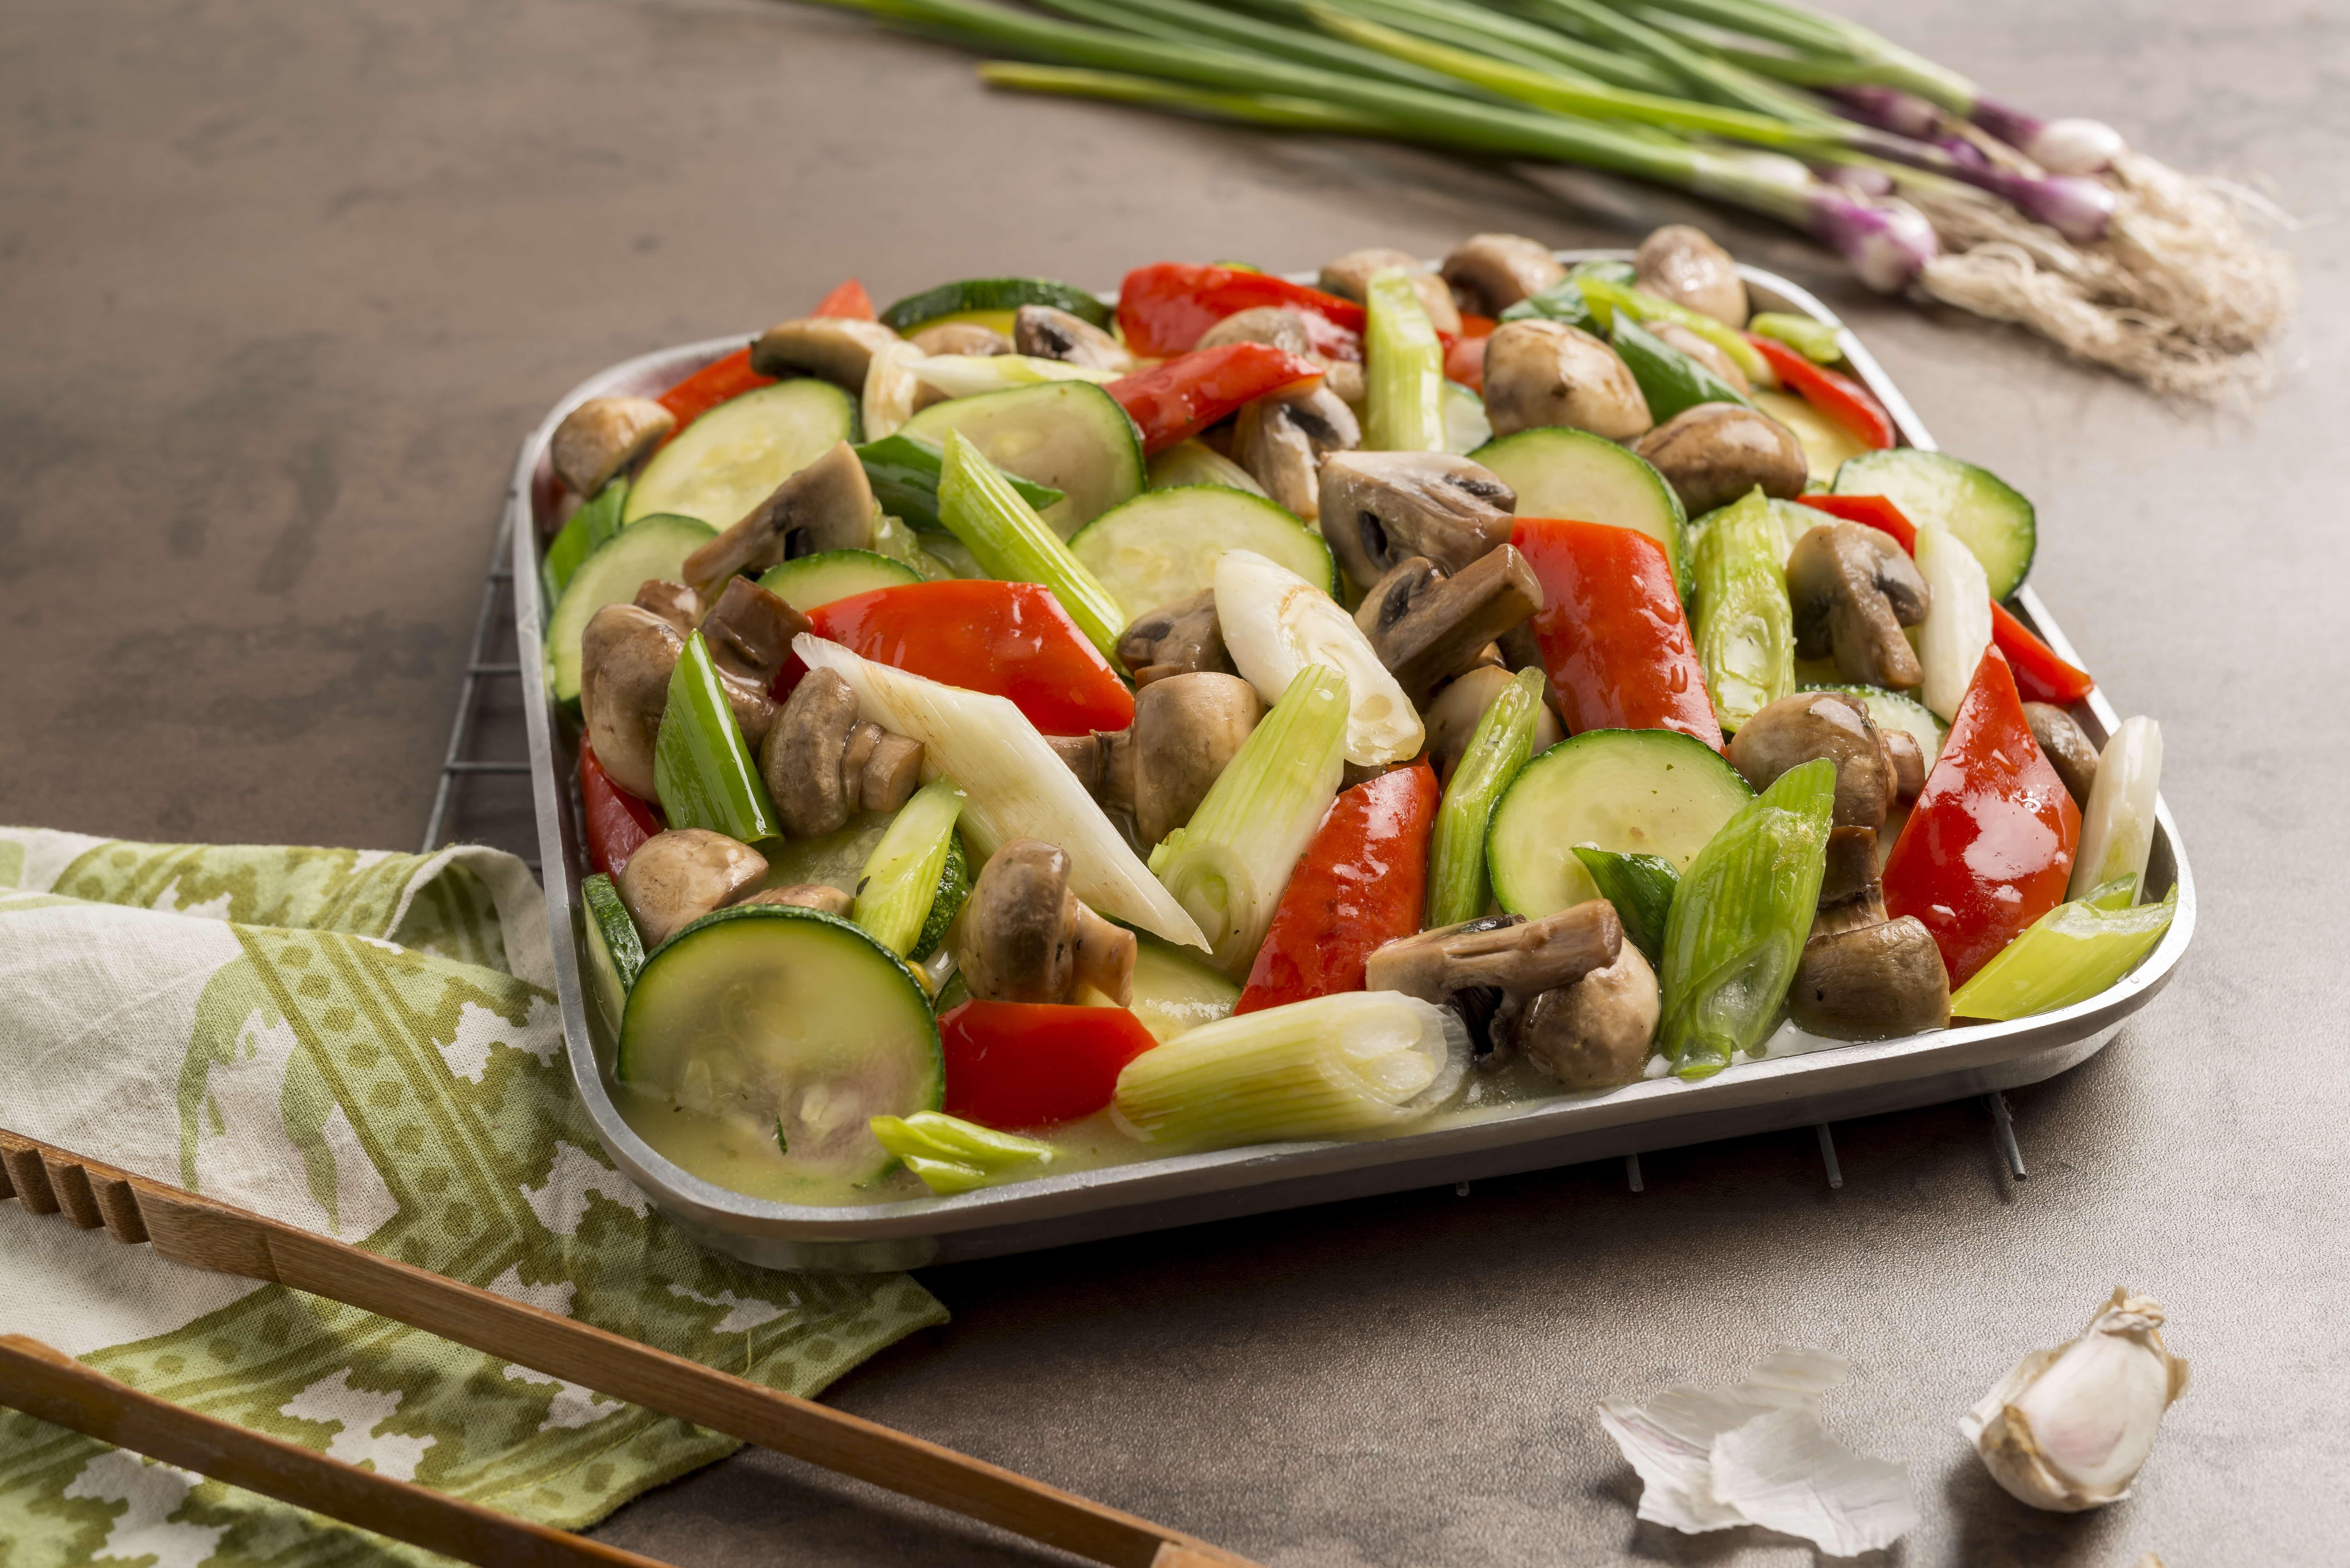 Salteado de vegetales al wok